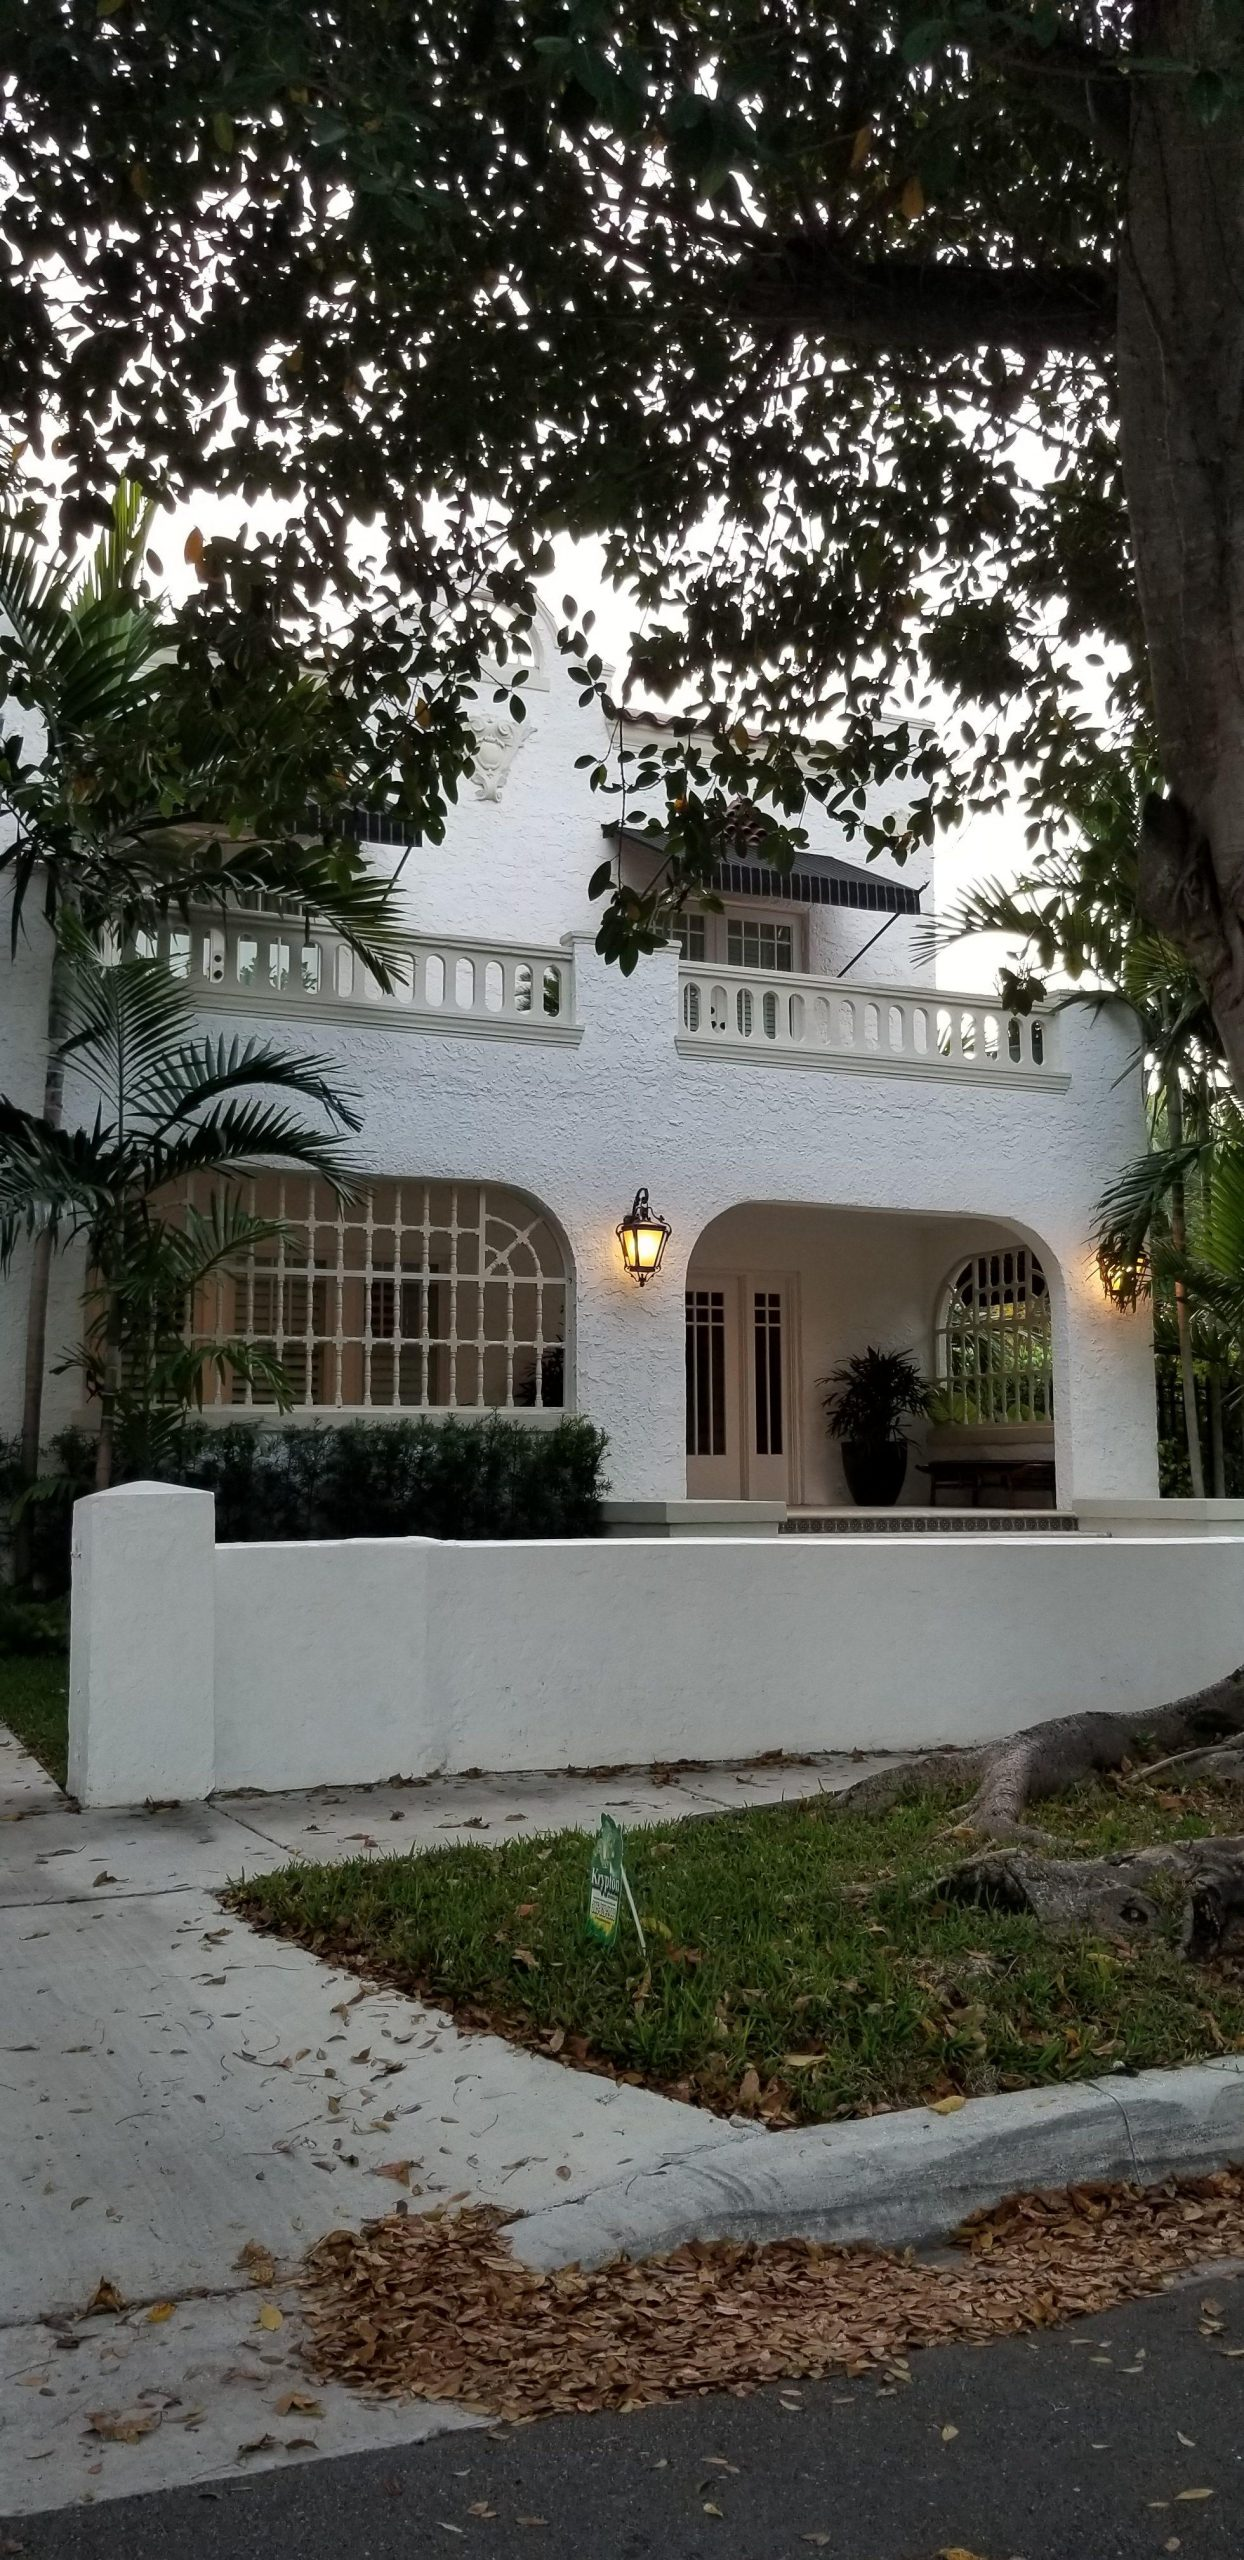 Hme e1555437234552 scaled - Shenandoah, un pintoresco barrio ubicado en los predios de la Pequeña Habana